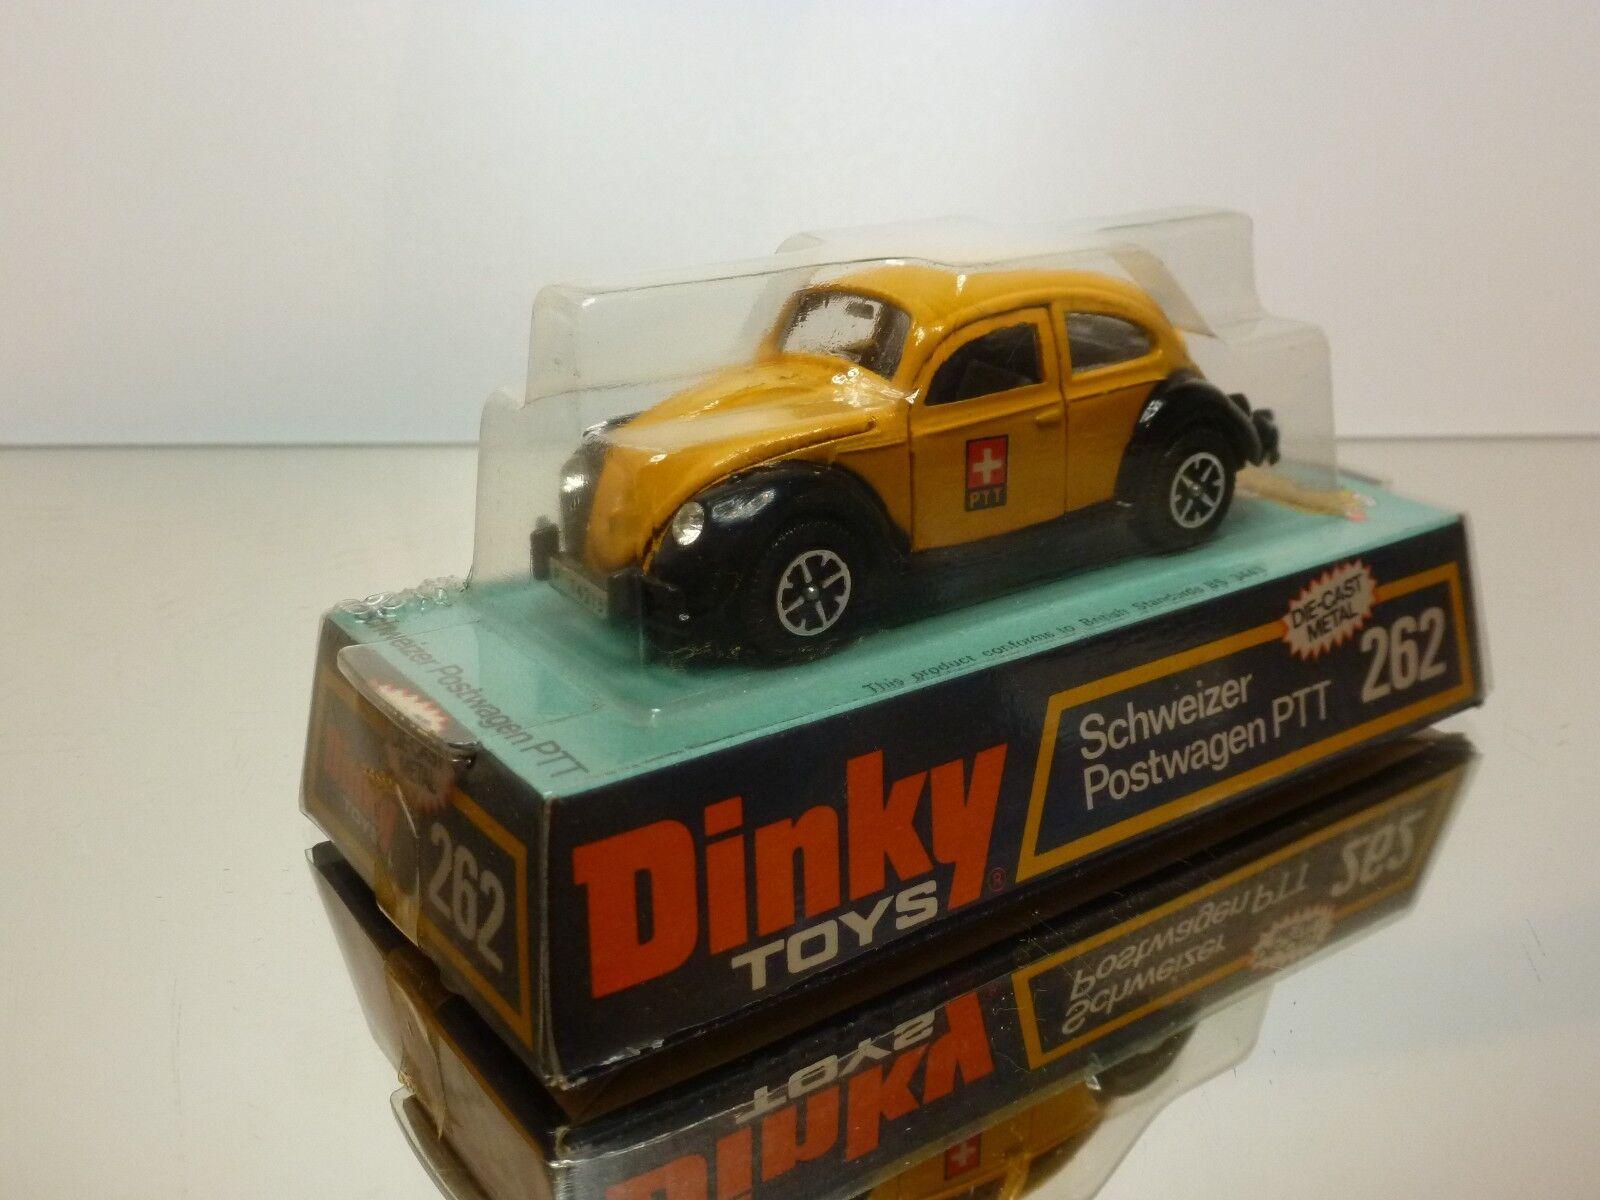 DINKY TOYS 262 VW VOLKSWAGEN BEETLE SWISS PTT POSTWAGEN - 1 43 - VG IN BOX